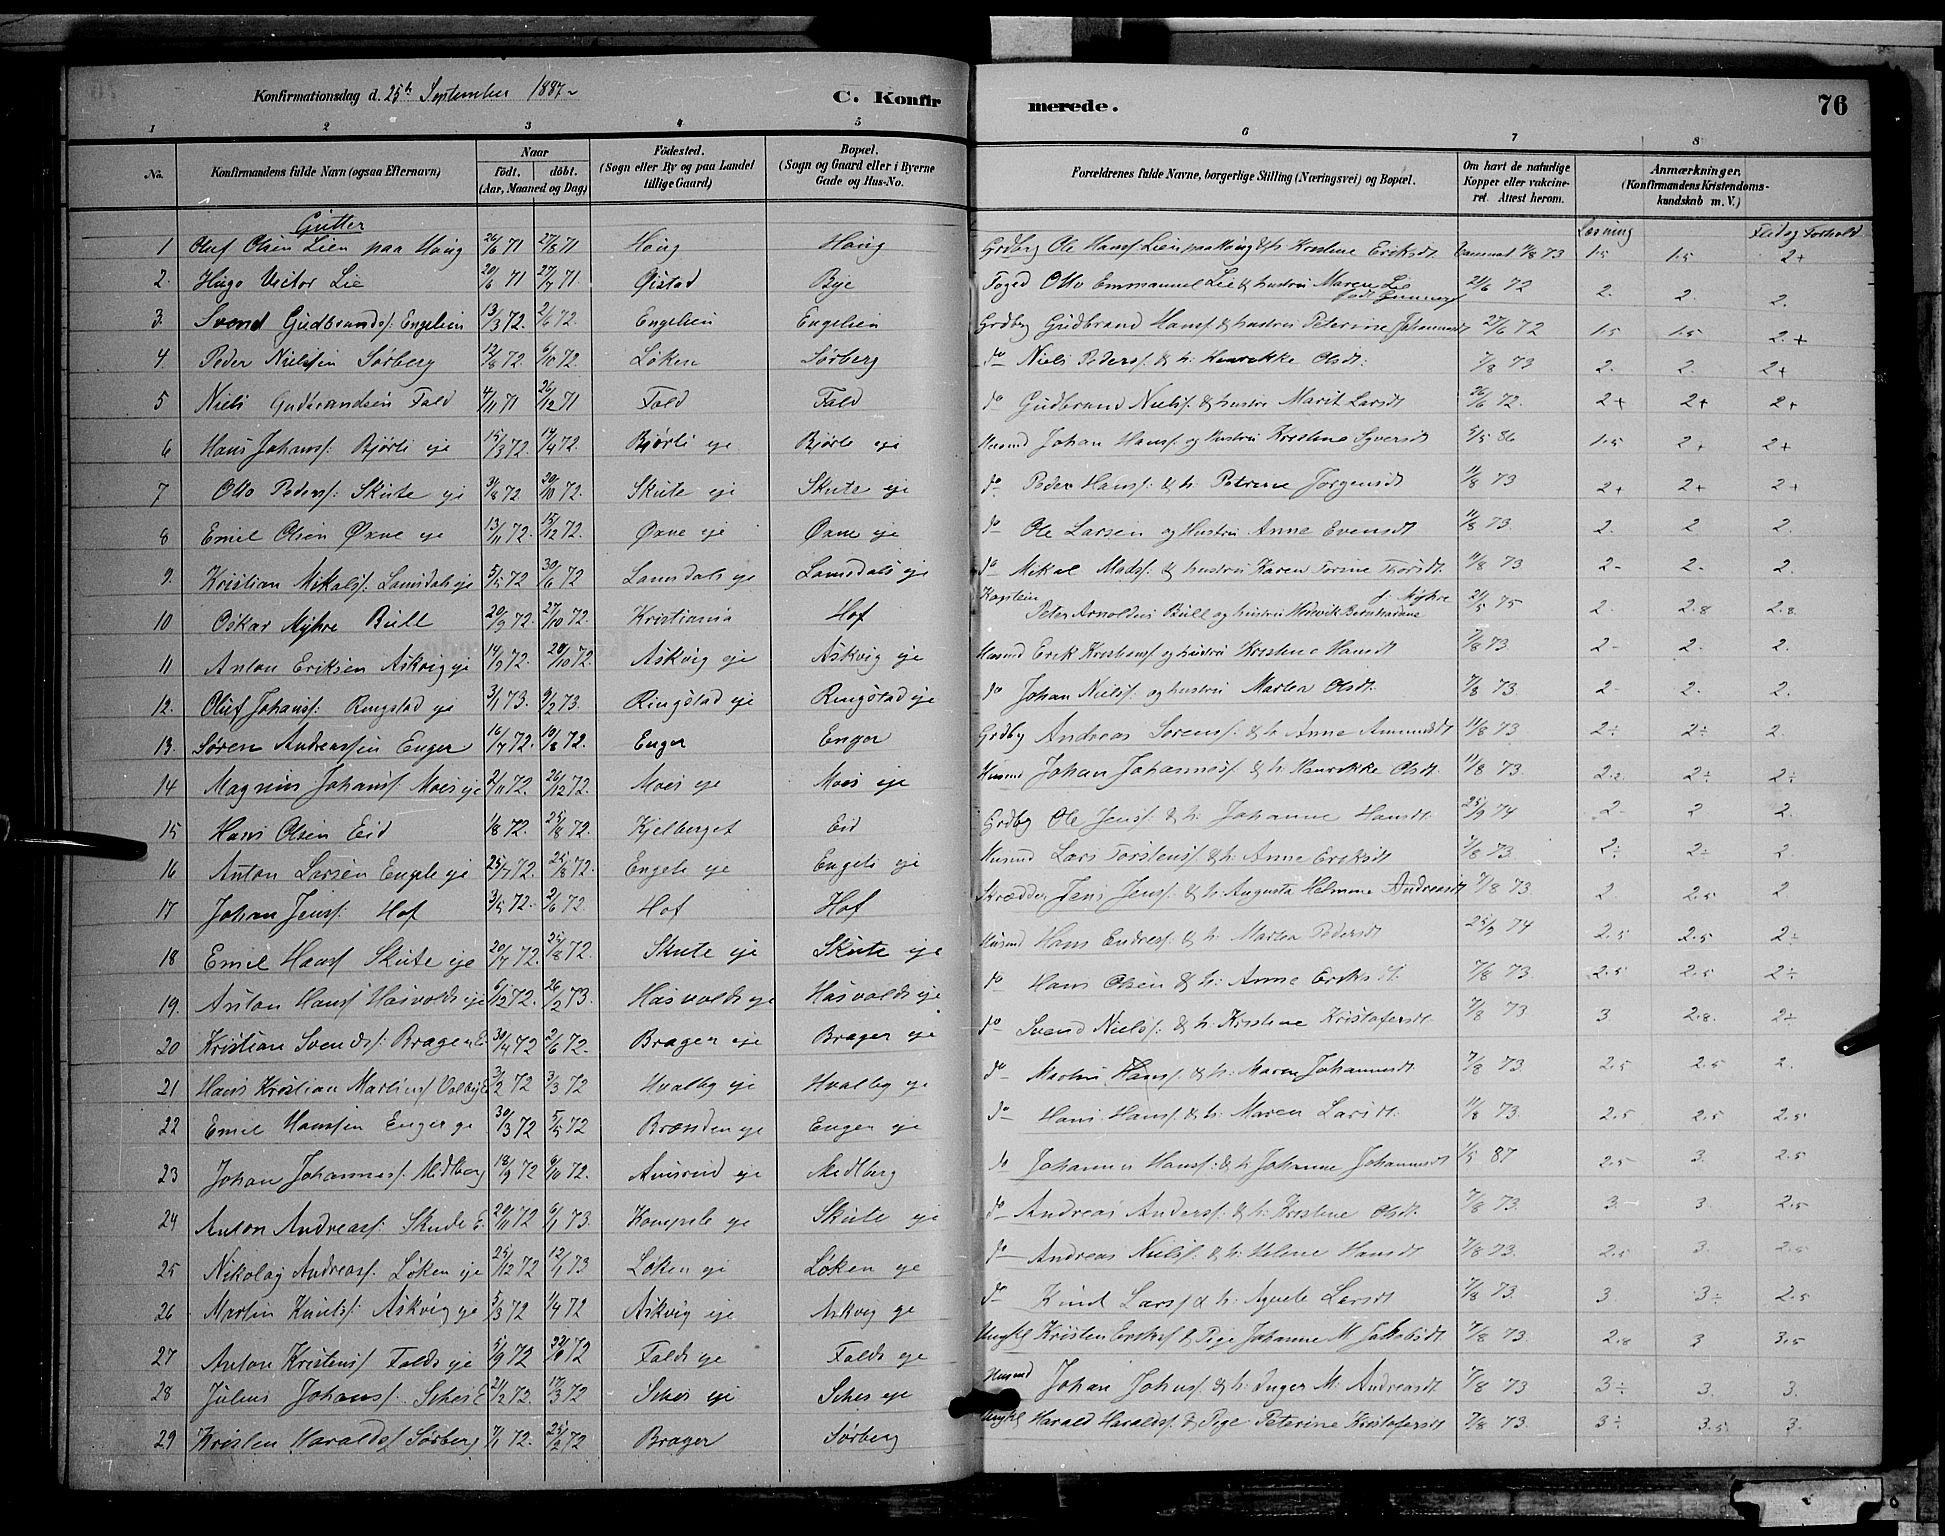 SAH, Søndre Land prestekontor, L/L0002: Klokkerbok nr. 2, 1884-1900, s. 76